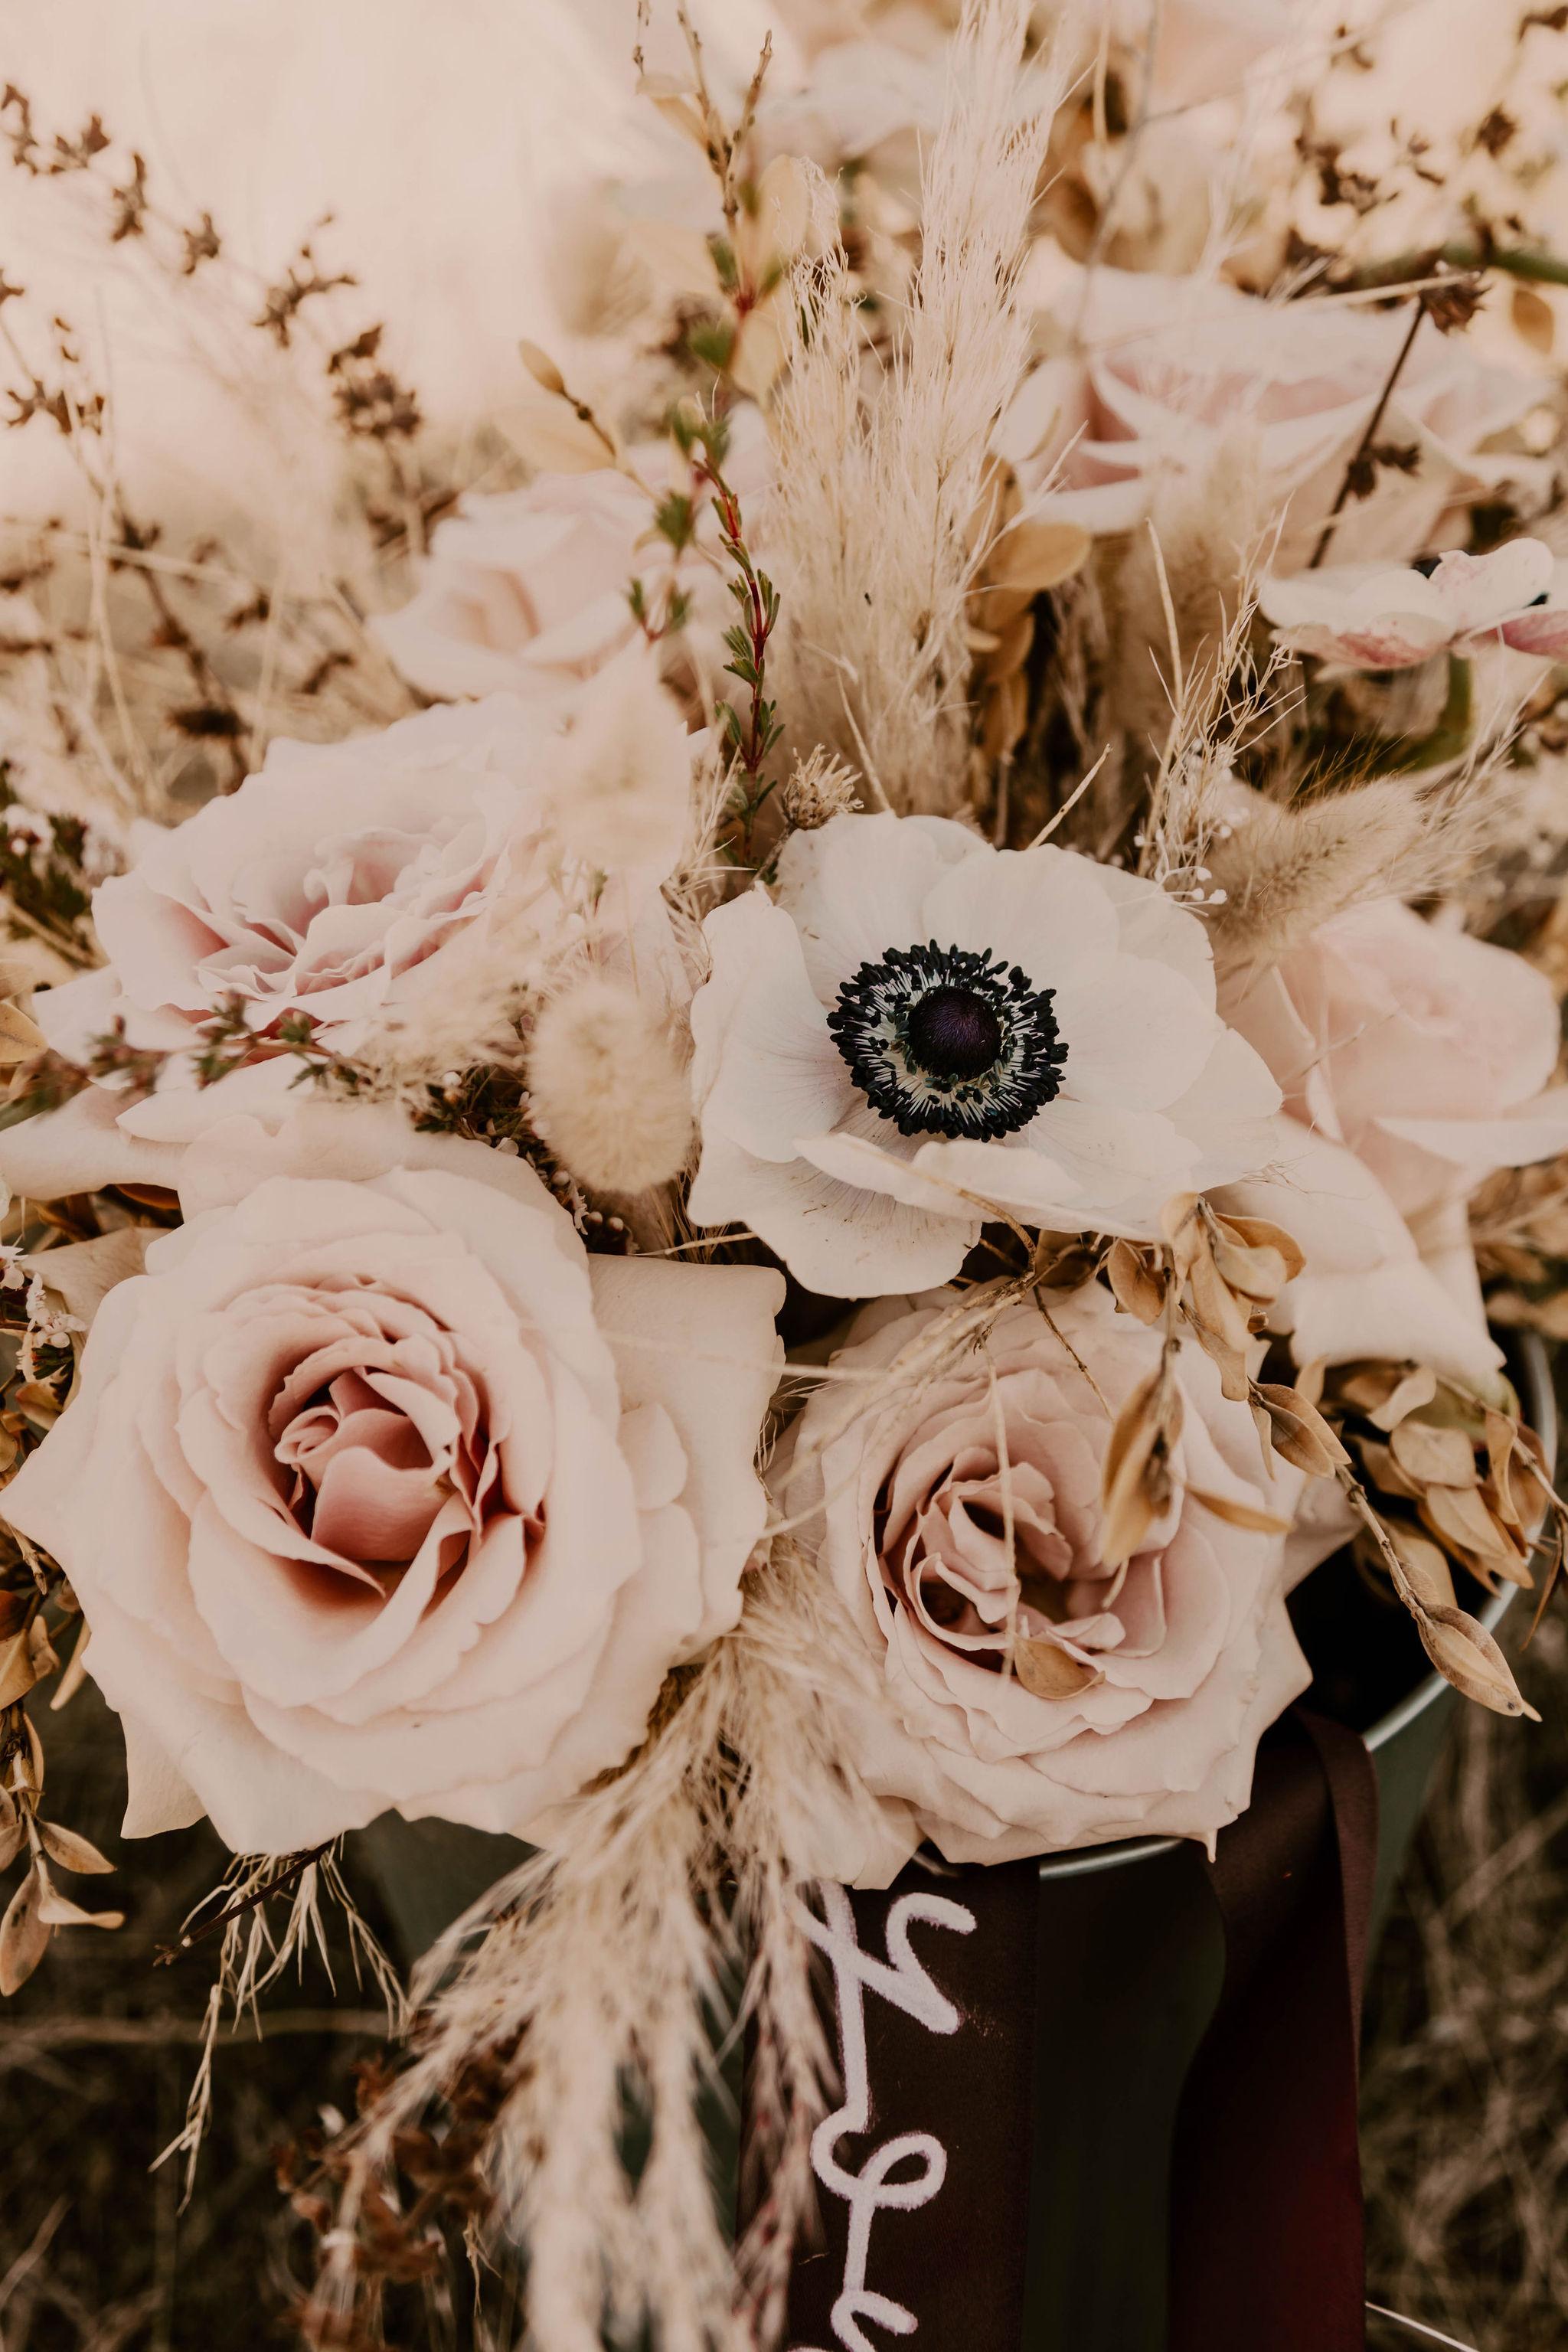 floral bridal bouquet summer wedding poppy spokane bride